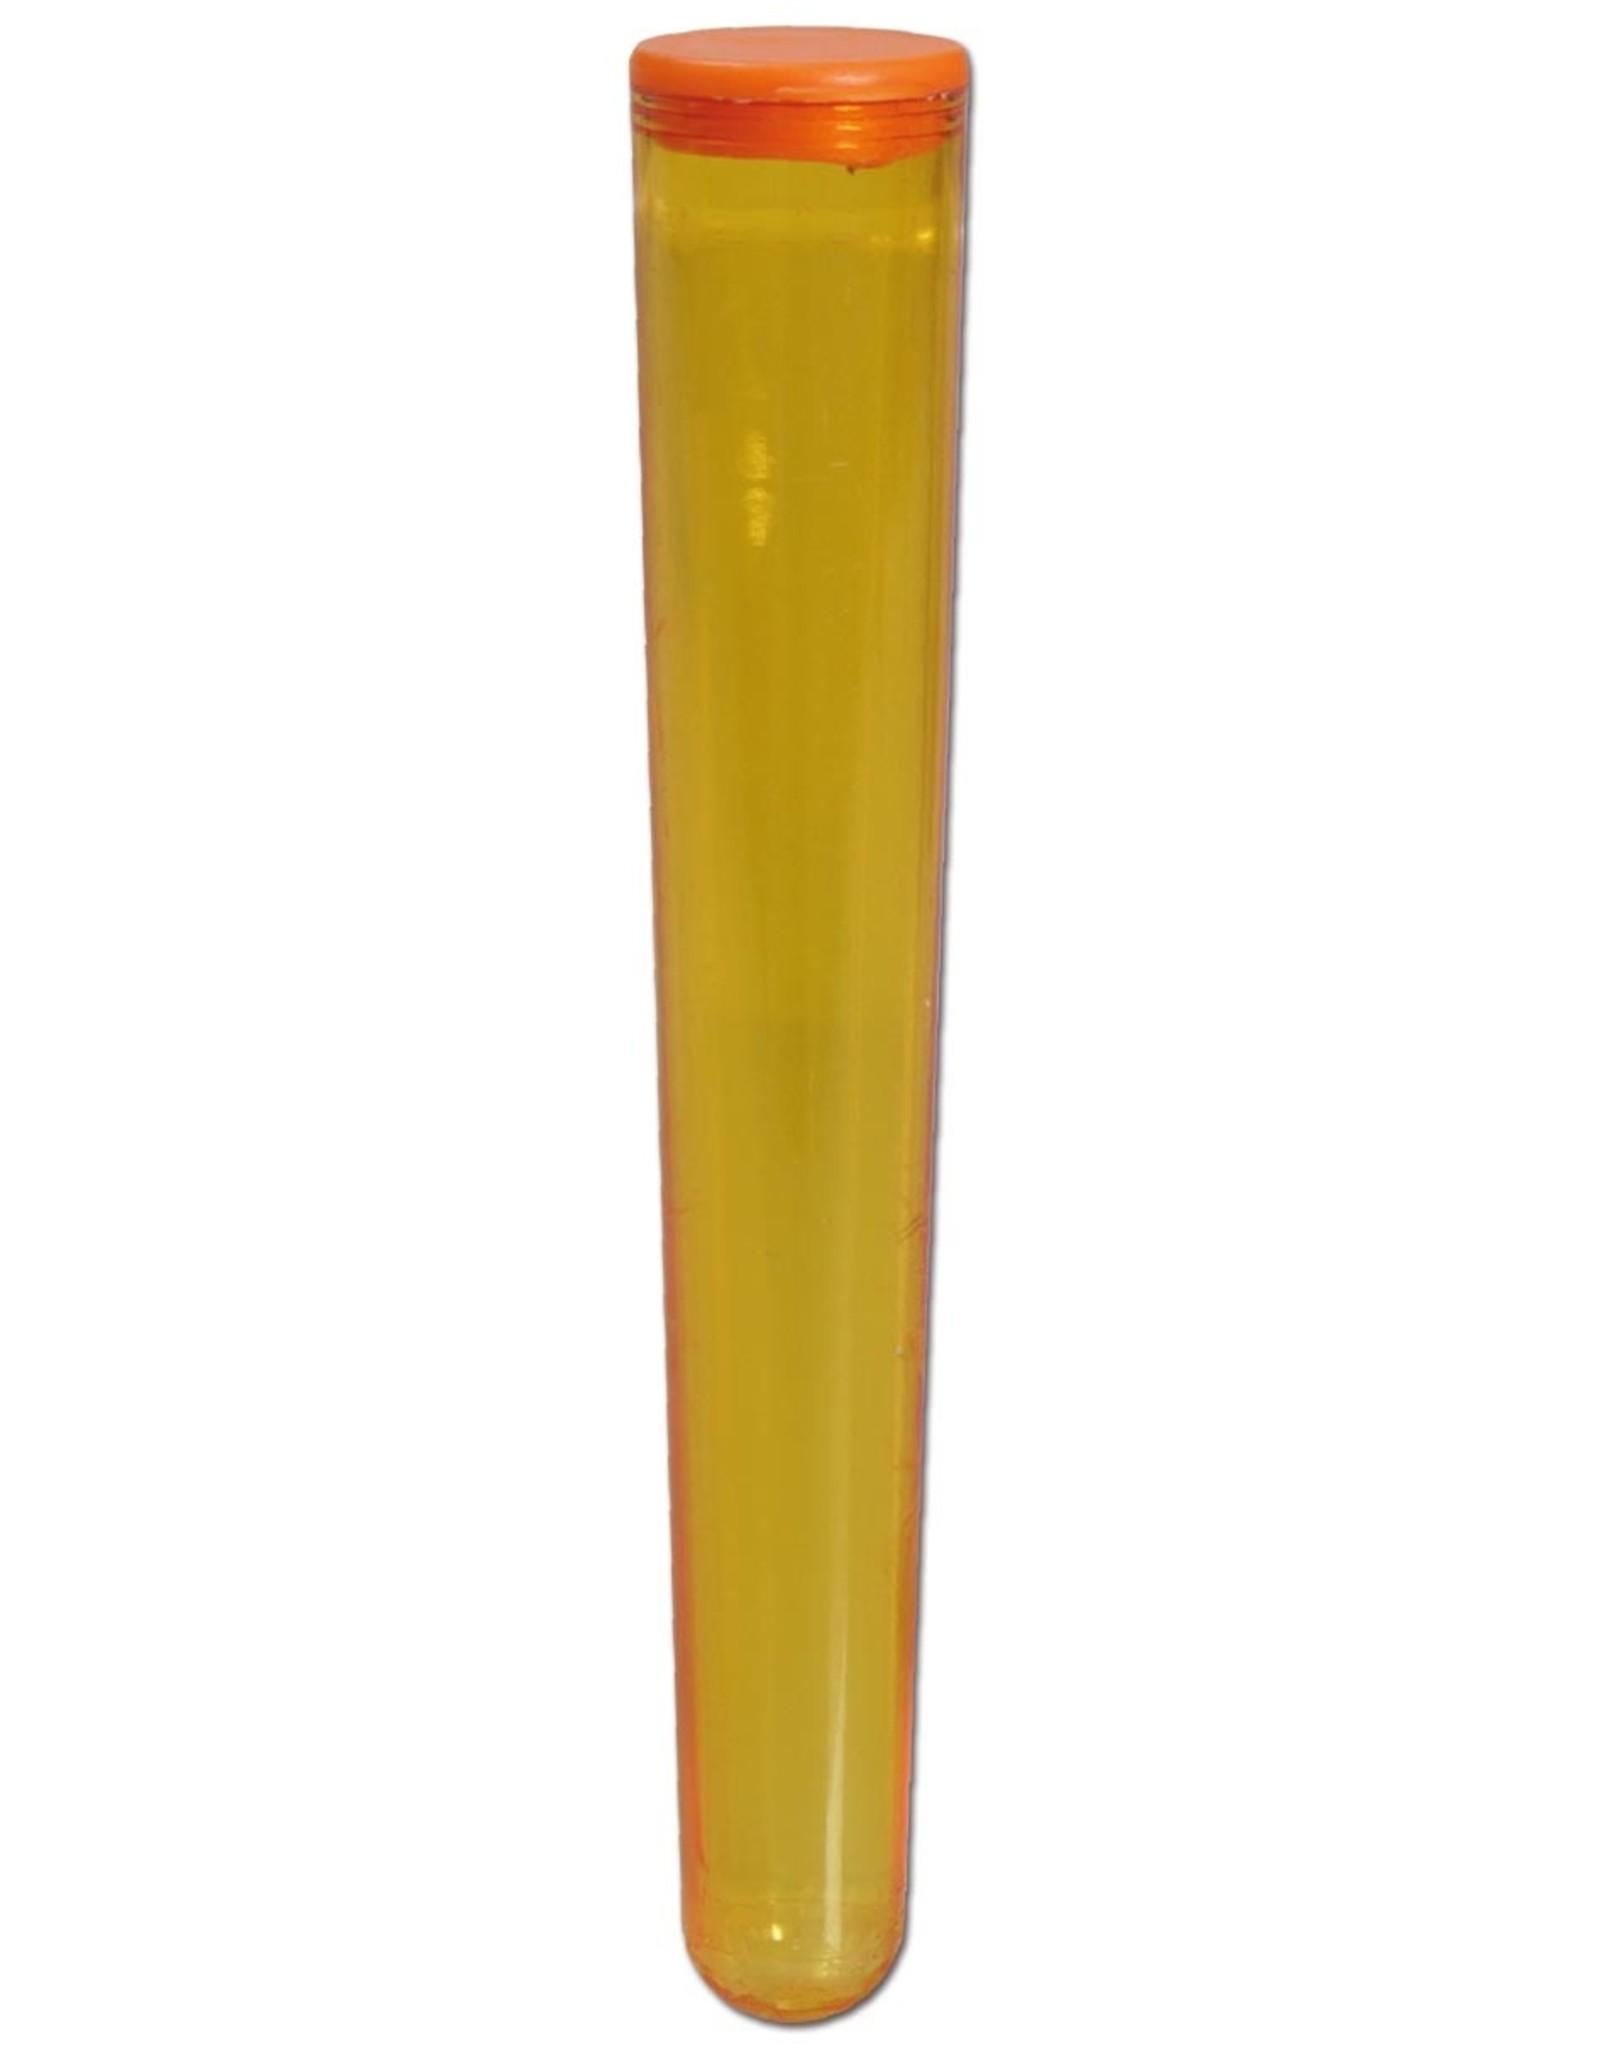 JTube L (clear orange)